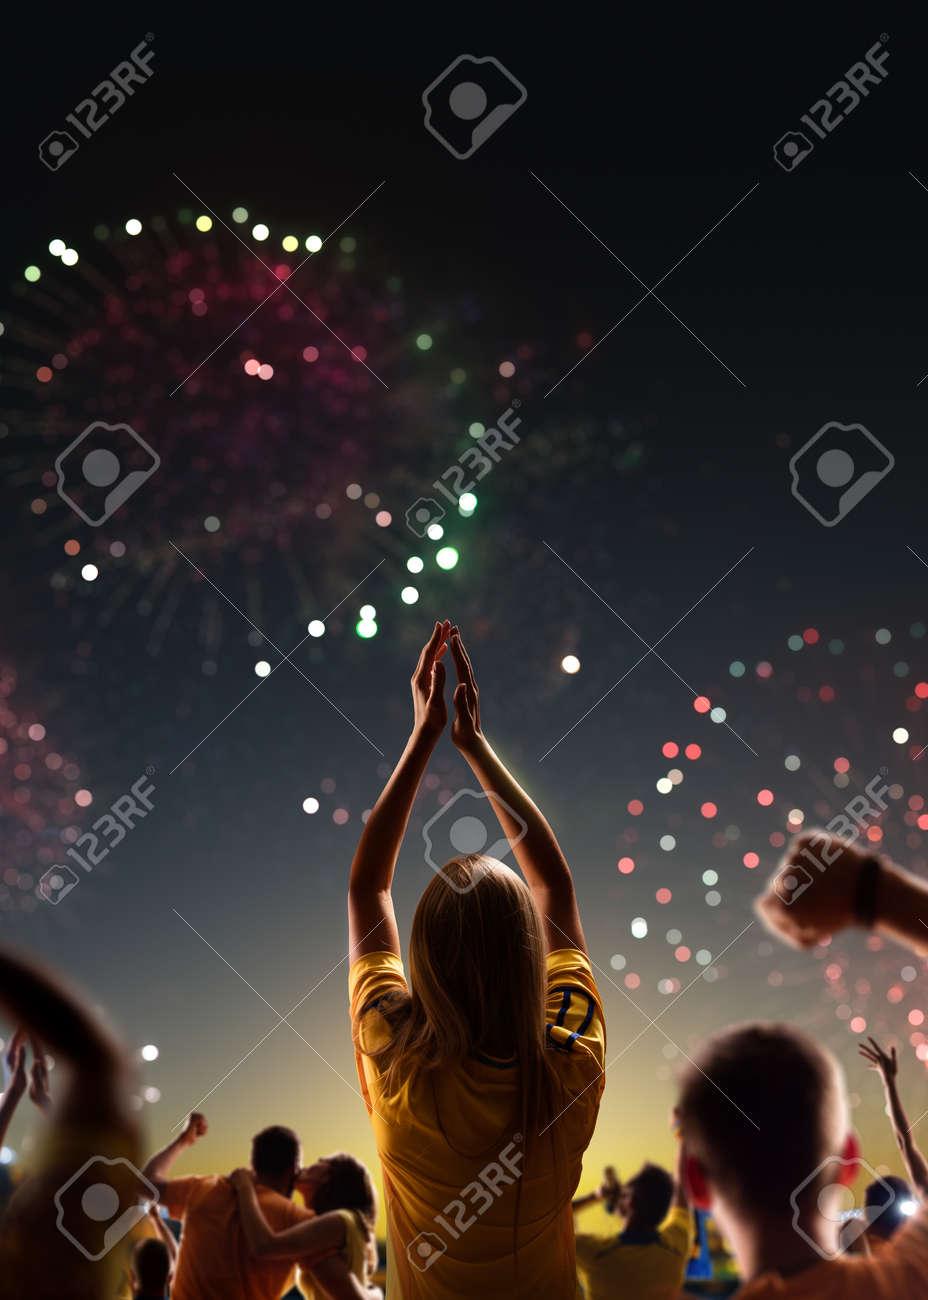 Fans celebrate in Stadium Arena night fireworks - 157252602